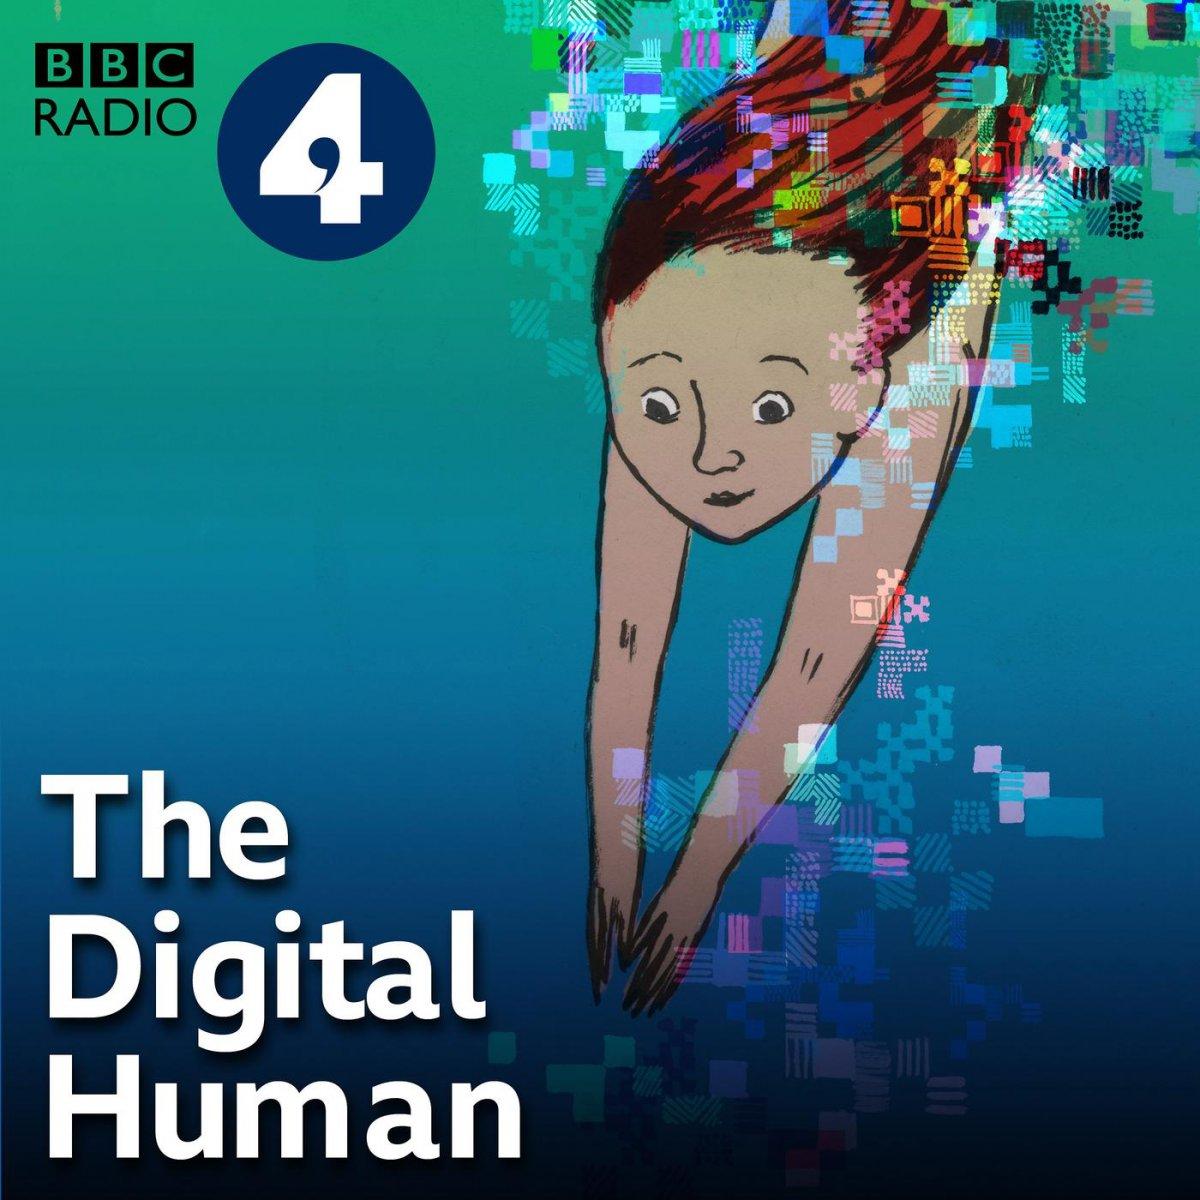 the-digital-human-bbc-radio-4-hOweKCfrDkH.1400x1400.jpg